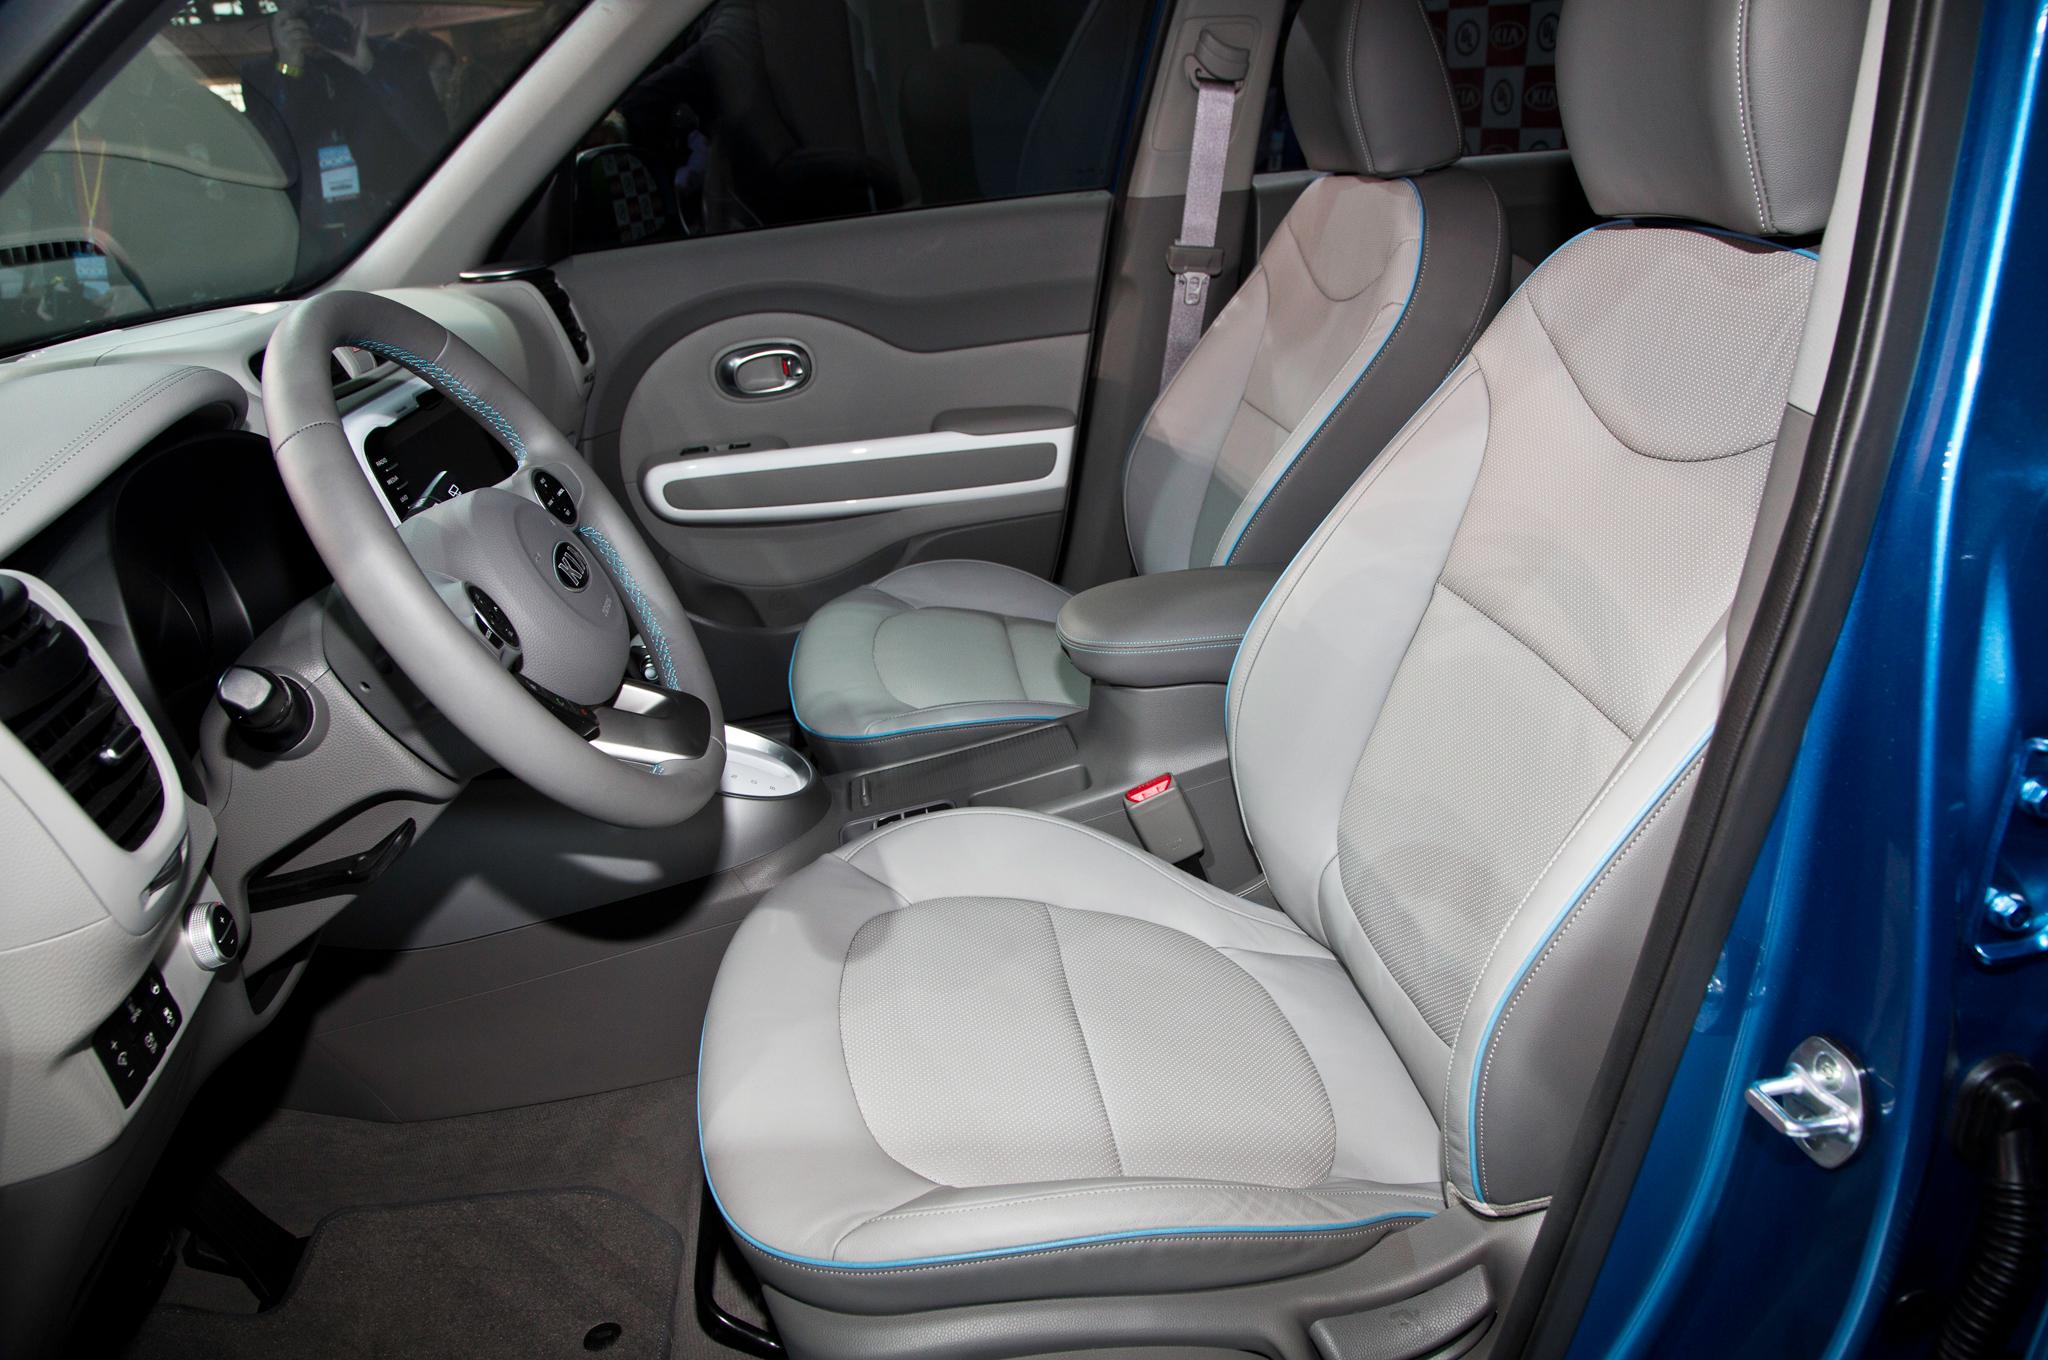 2015 Kia Soul EV Front Interior Seats